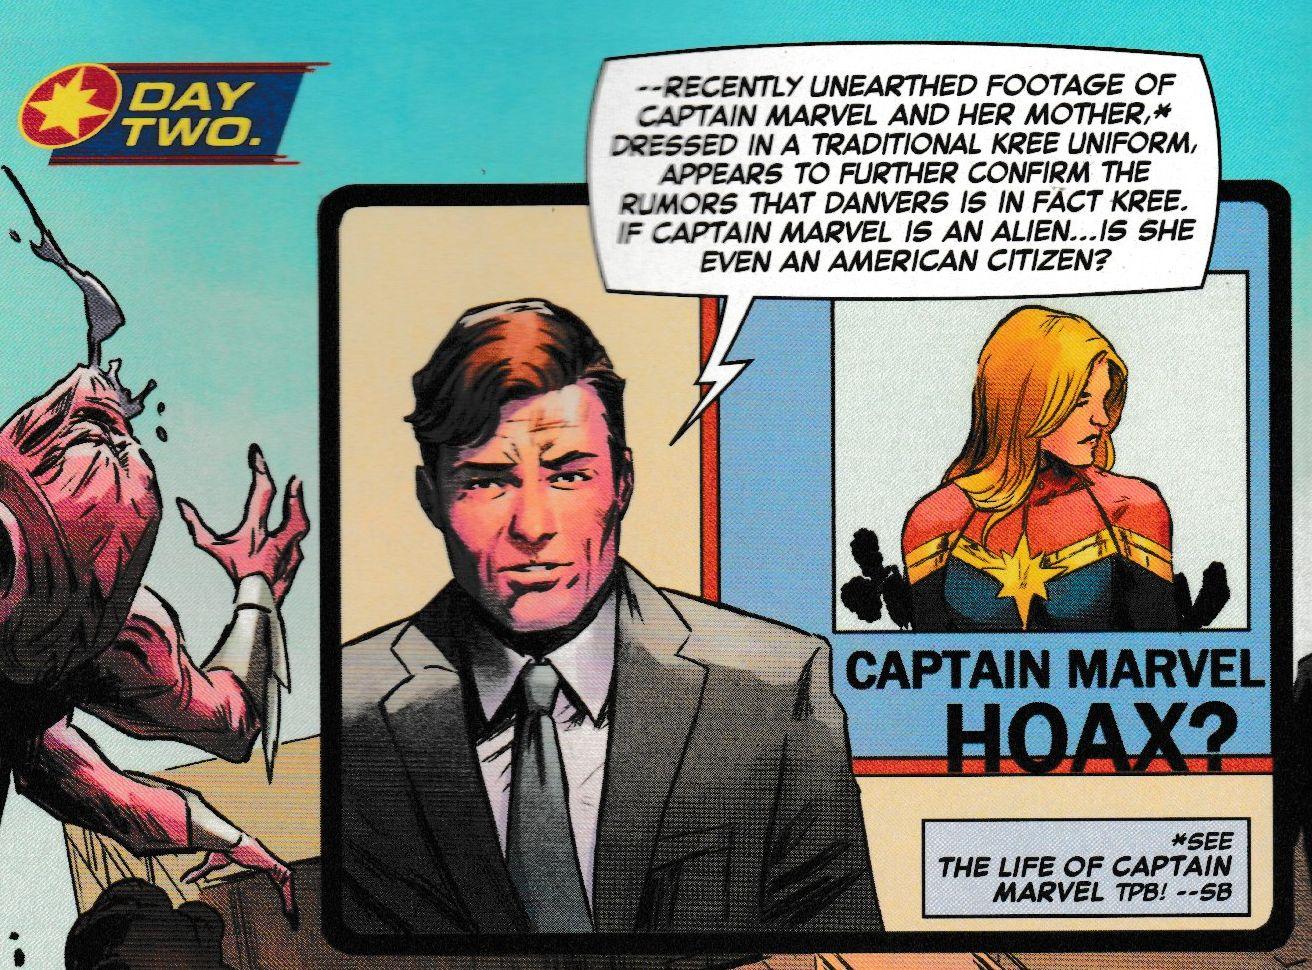 Captain Marvel #8 Gets Rather Topical, Regarding President Trump's Tweets (Spoilers)